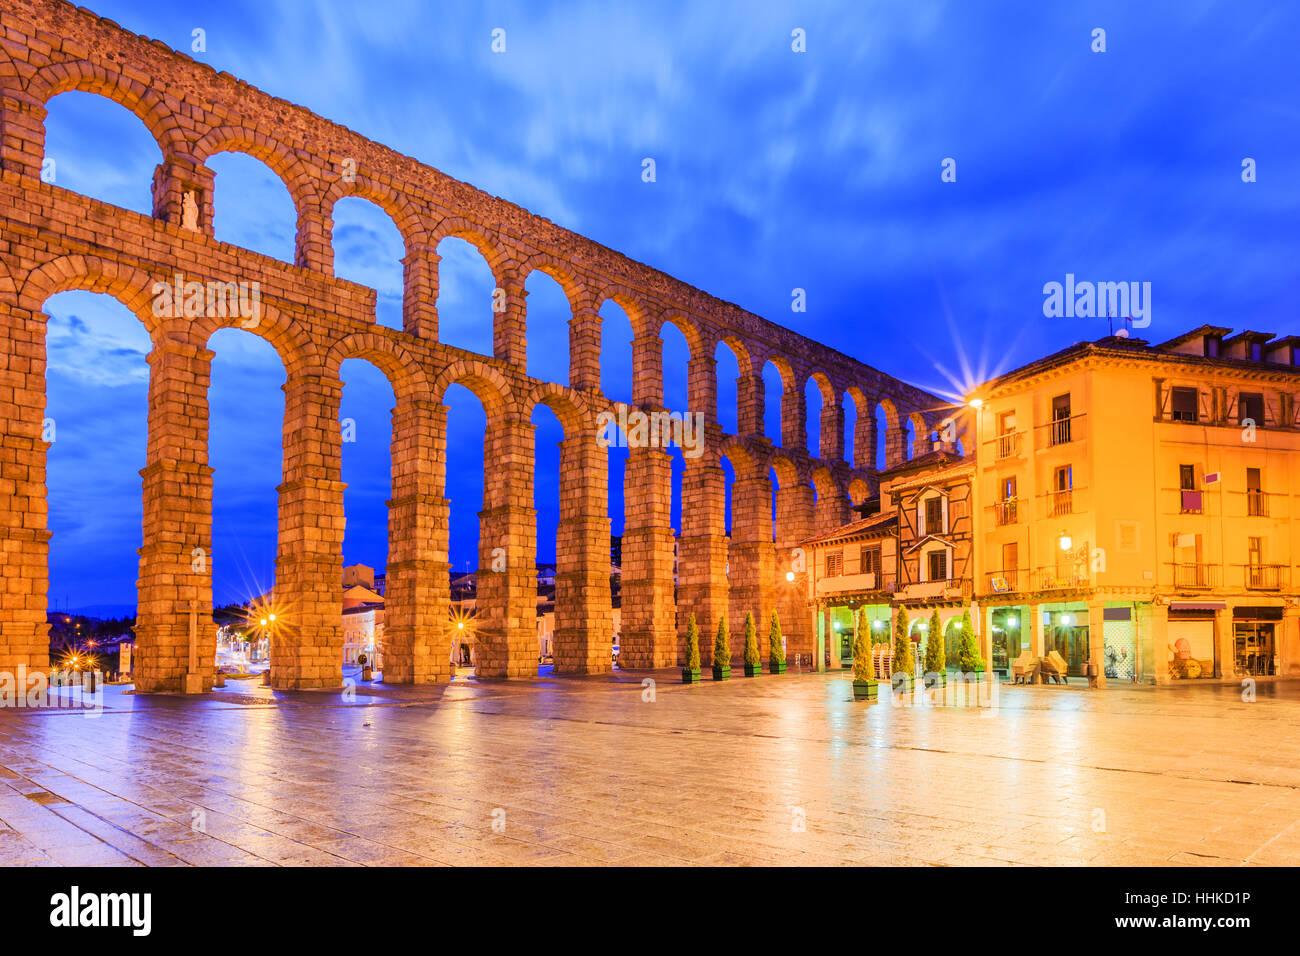 Segovia, Spain. Plaza del Azoguejo and the ancient Roman aqueduct. - Stock Image